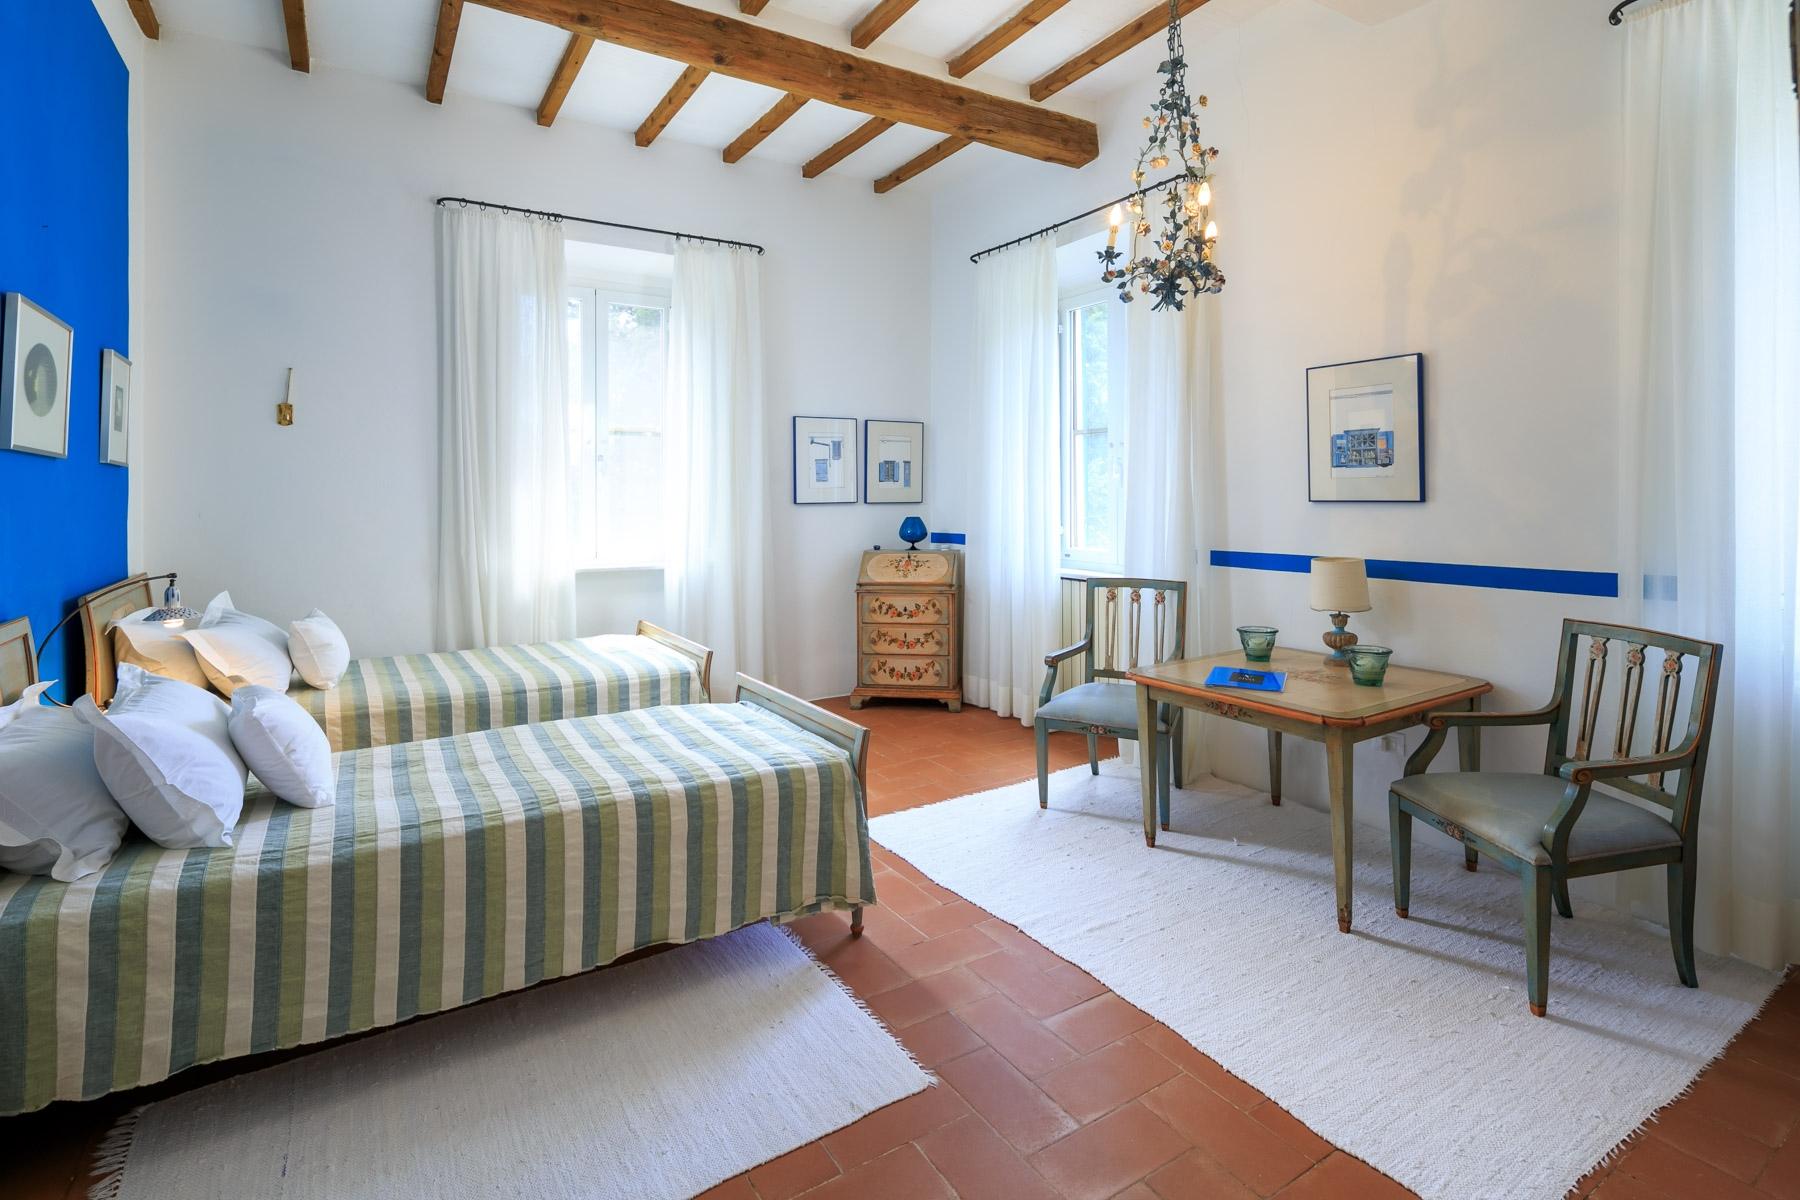 Villa in Vendita a Campiglia Marittima: 5 locali, 1100 mq - Foto 15